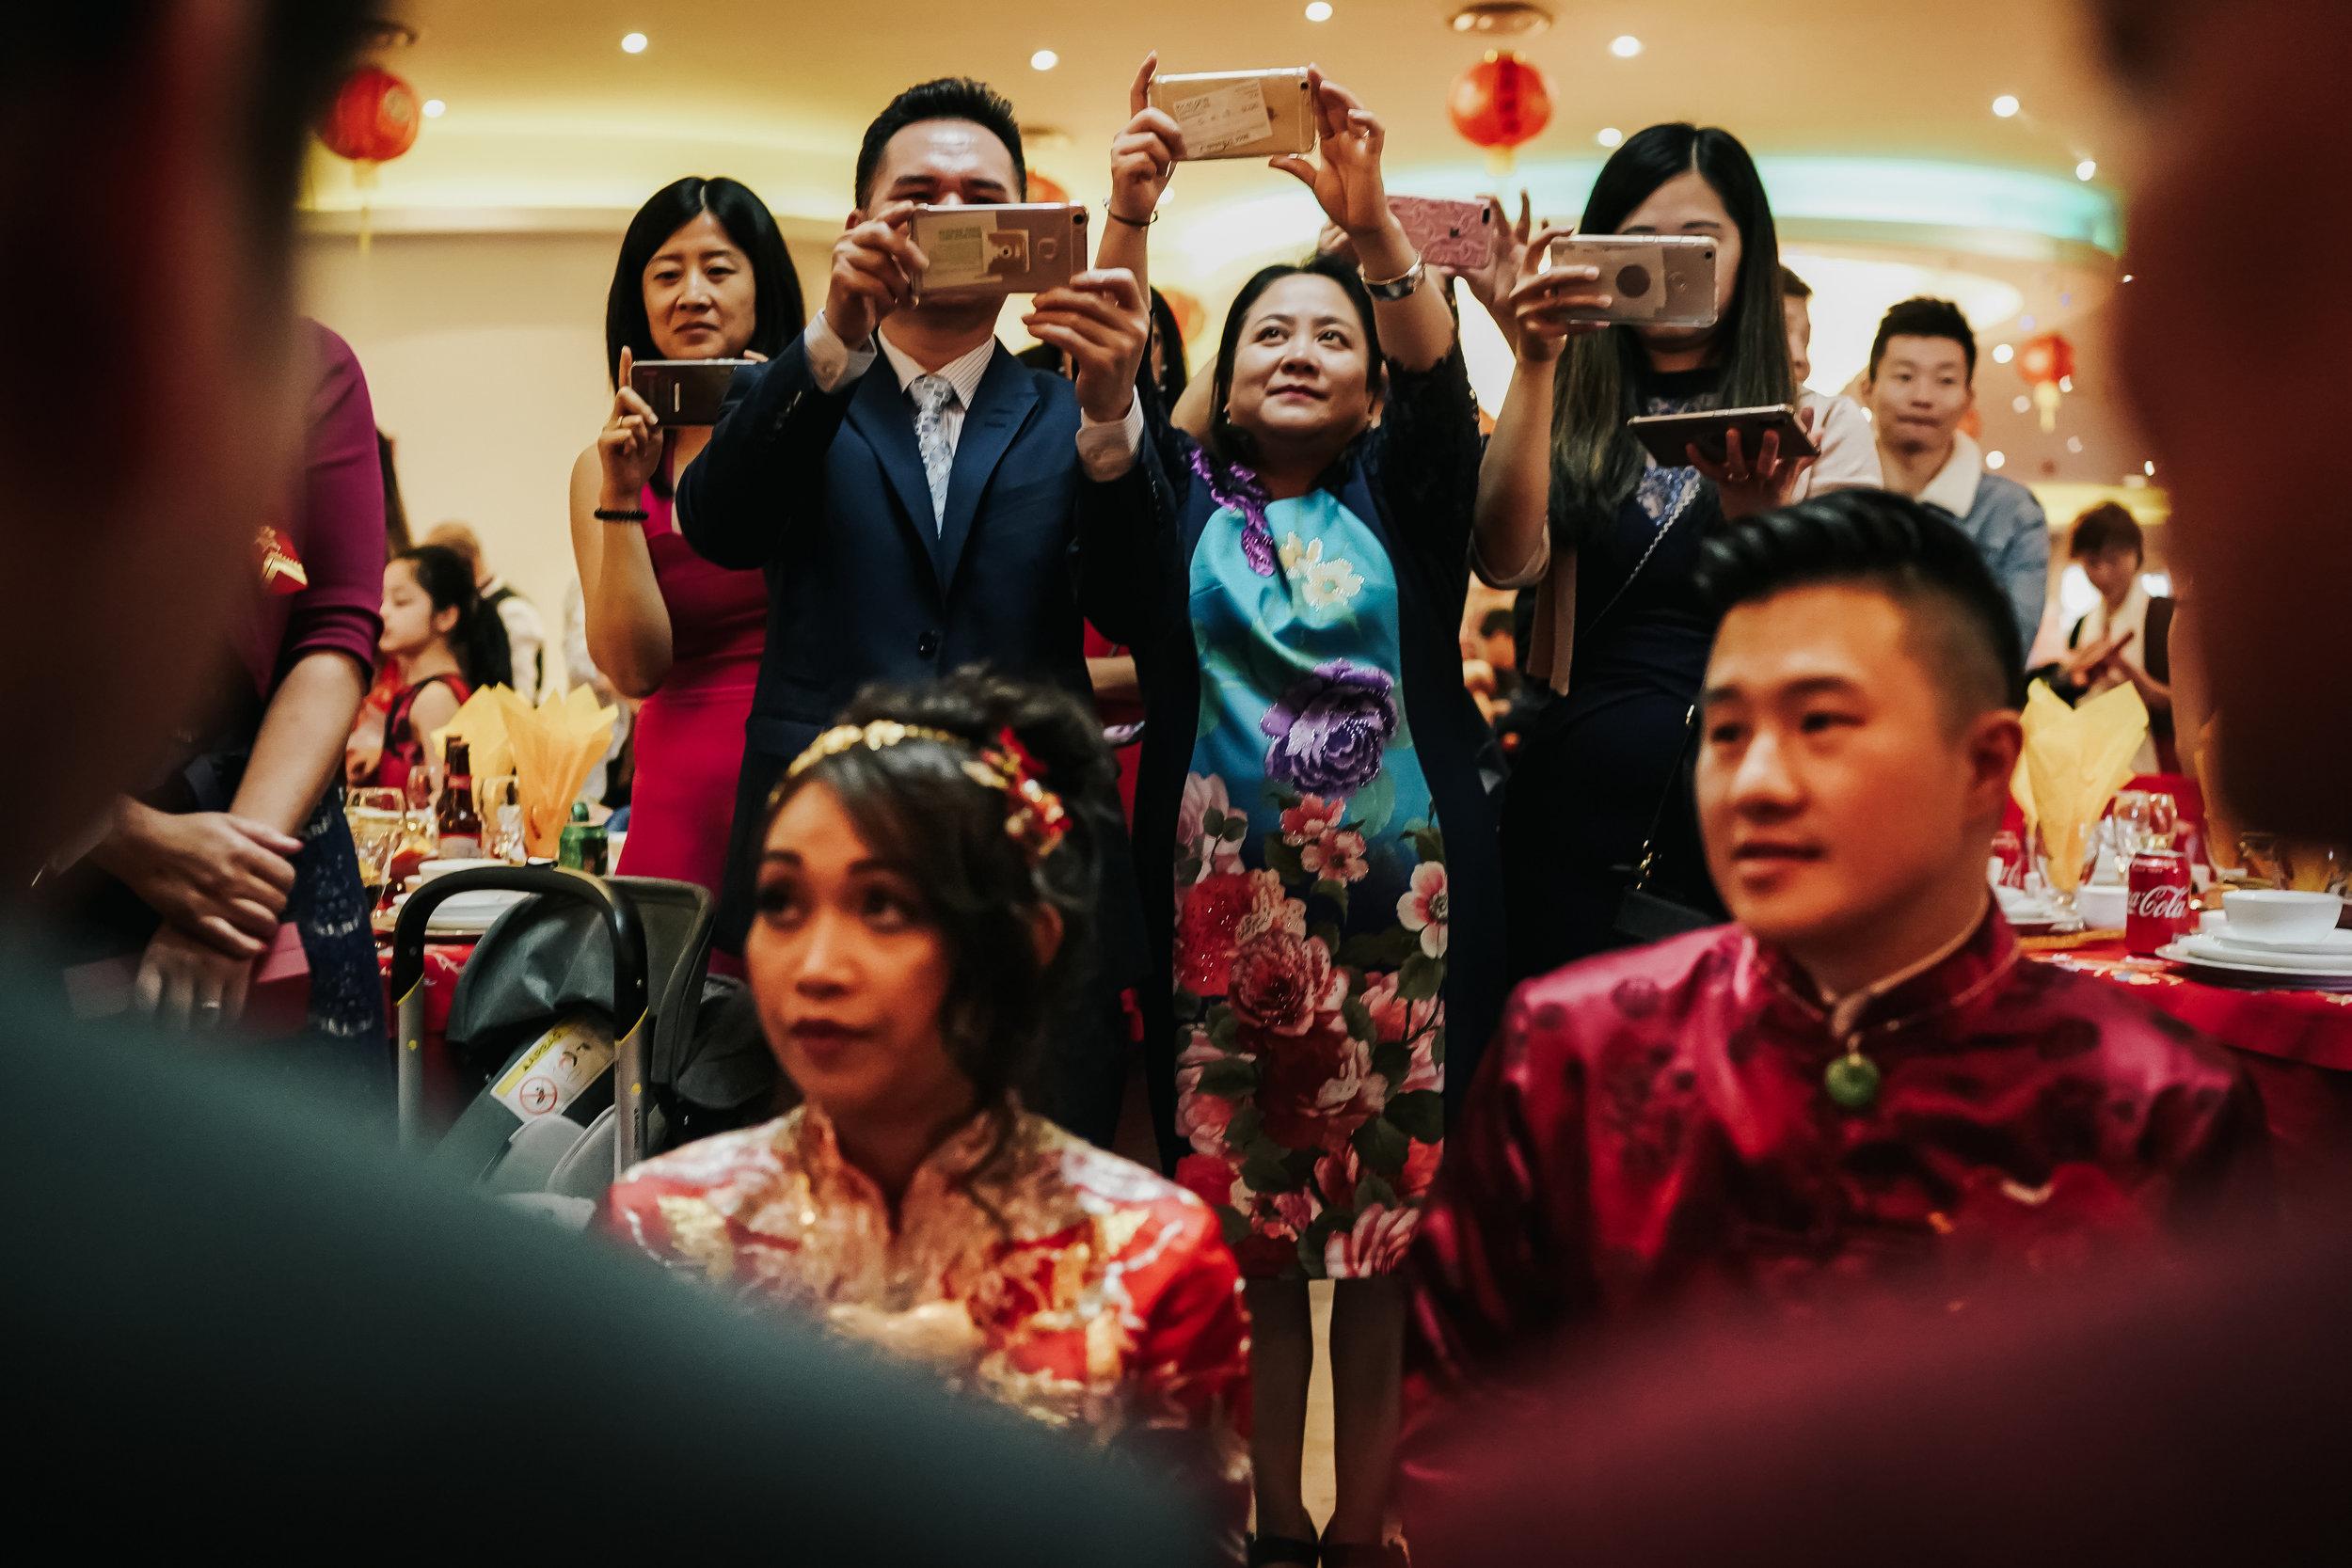 Chinese Wedding Photography Manchester wedding photographer Cheshire - 040.jpg